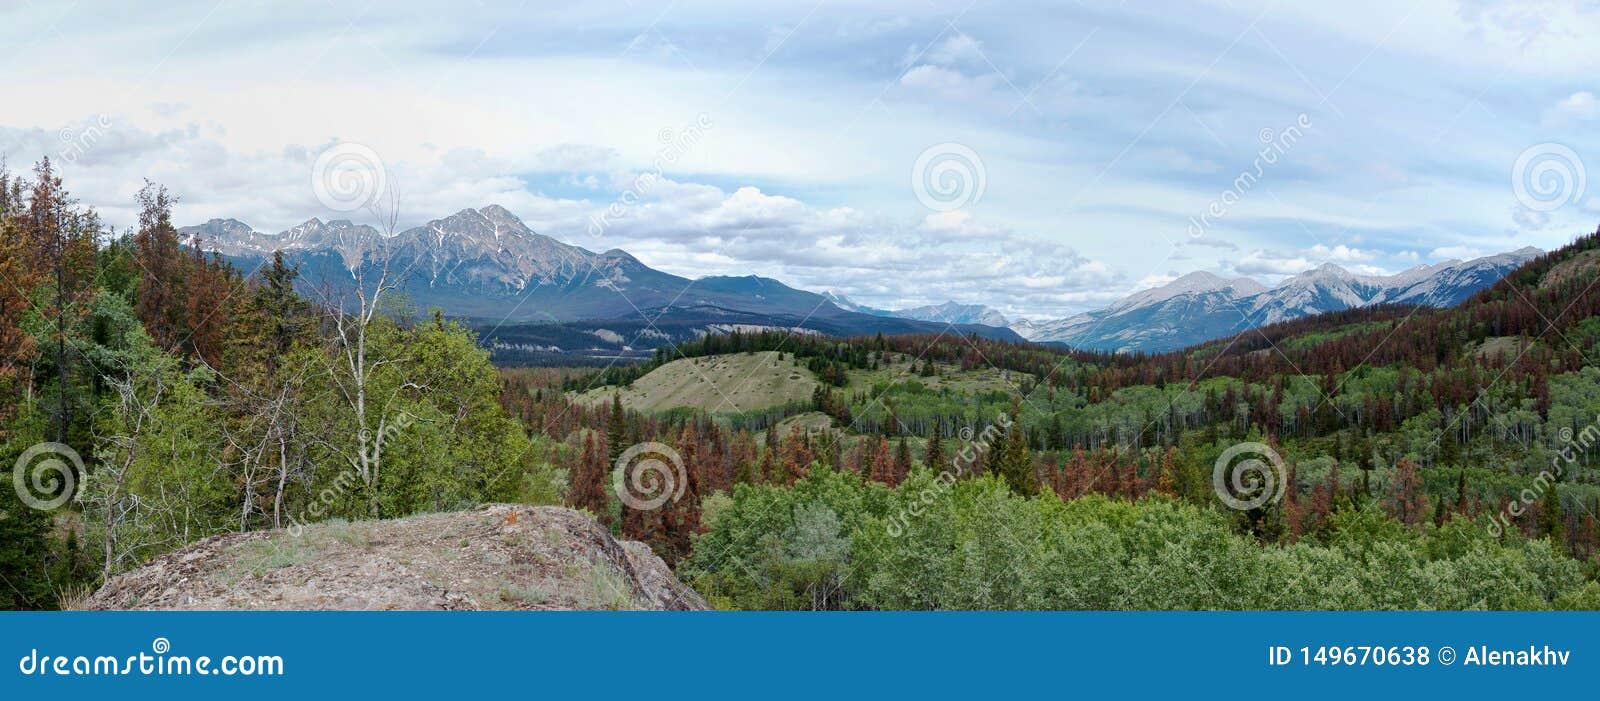 Panoramautsikt av de steniga bergen